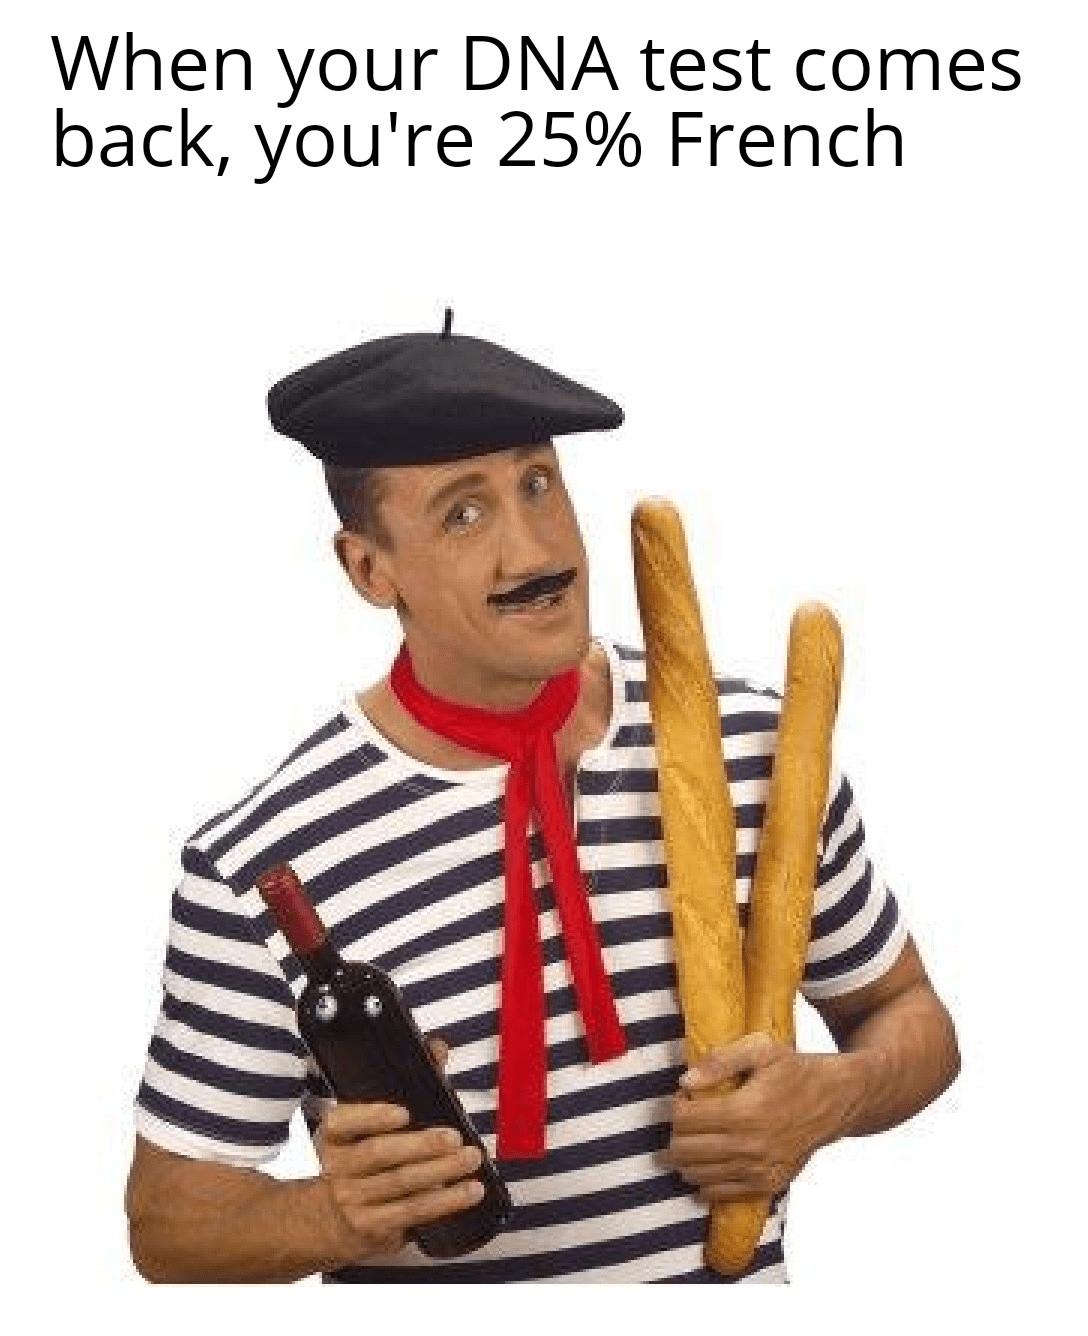 Oui Oui Baguette Meme